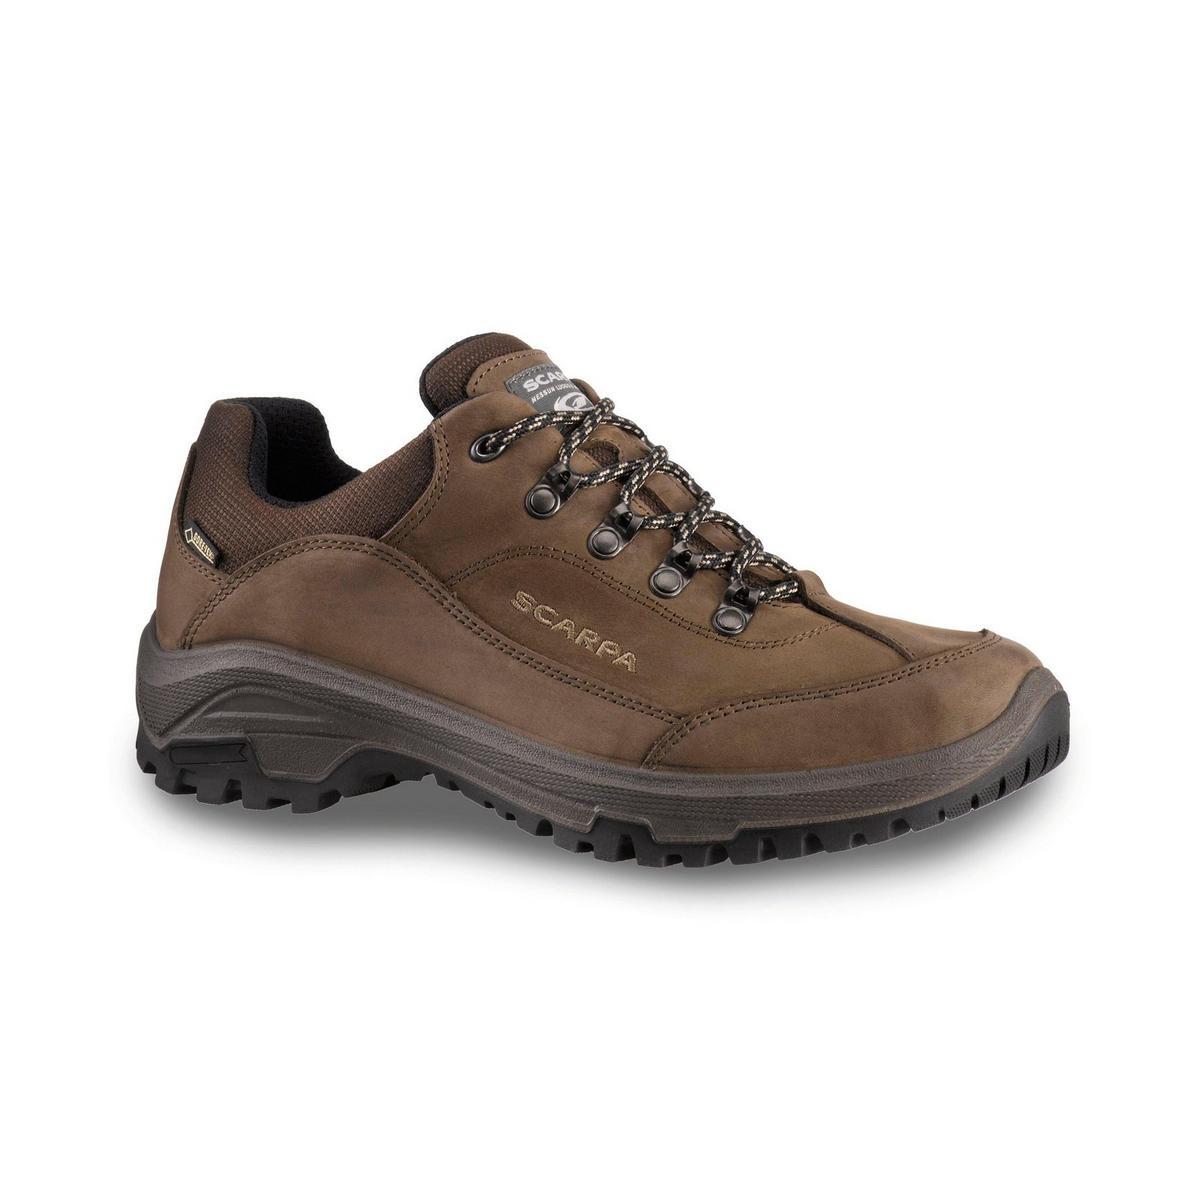 Scarpa Men's Cyrus Gore-Tex Walking Shoe Approach Shoe